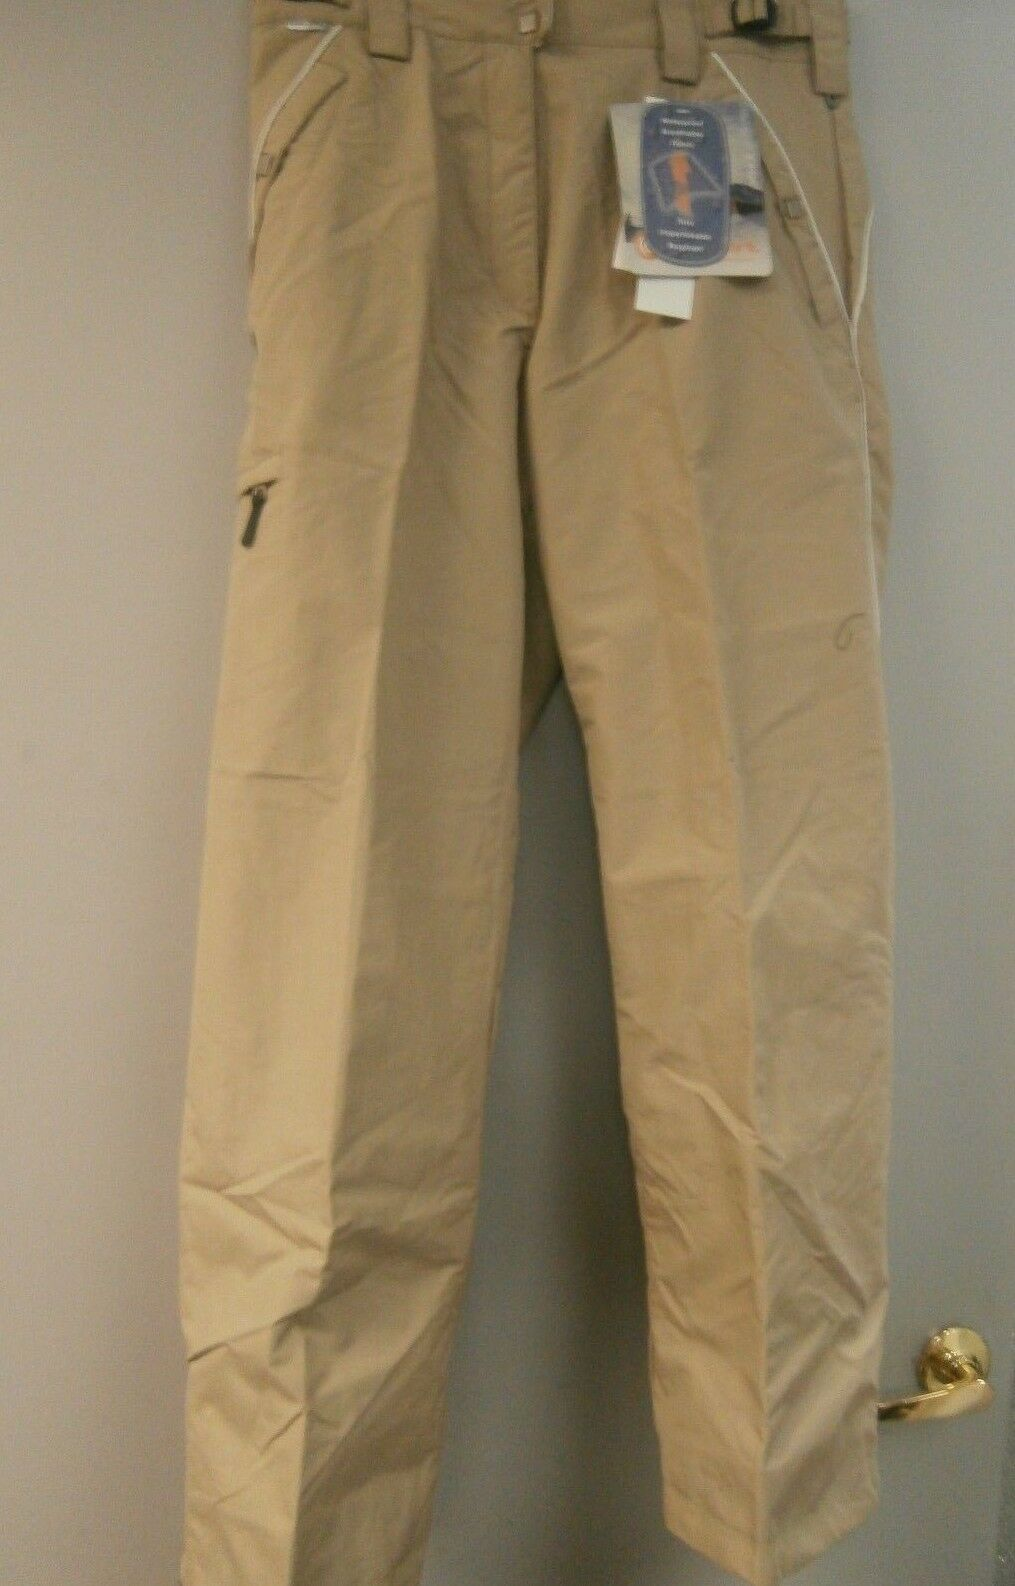 Columbia Women's Congreen Ski Pants  Beige Size Medium New     free shipping worldwide